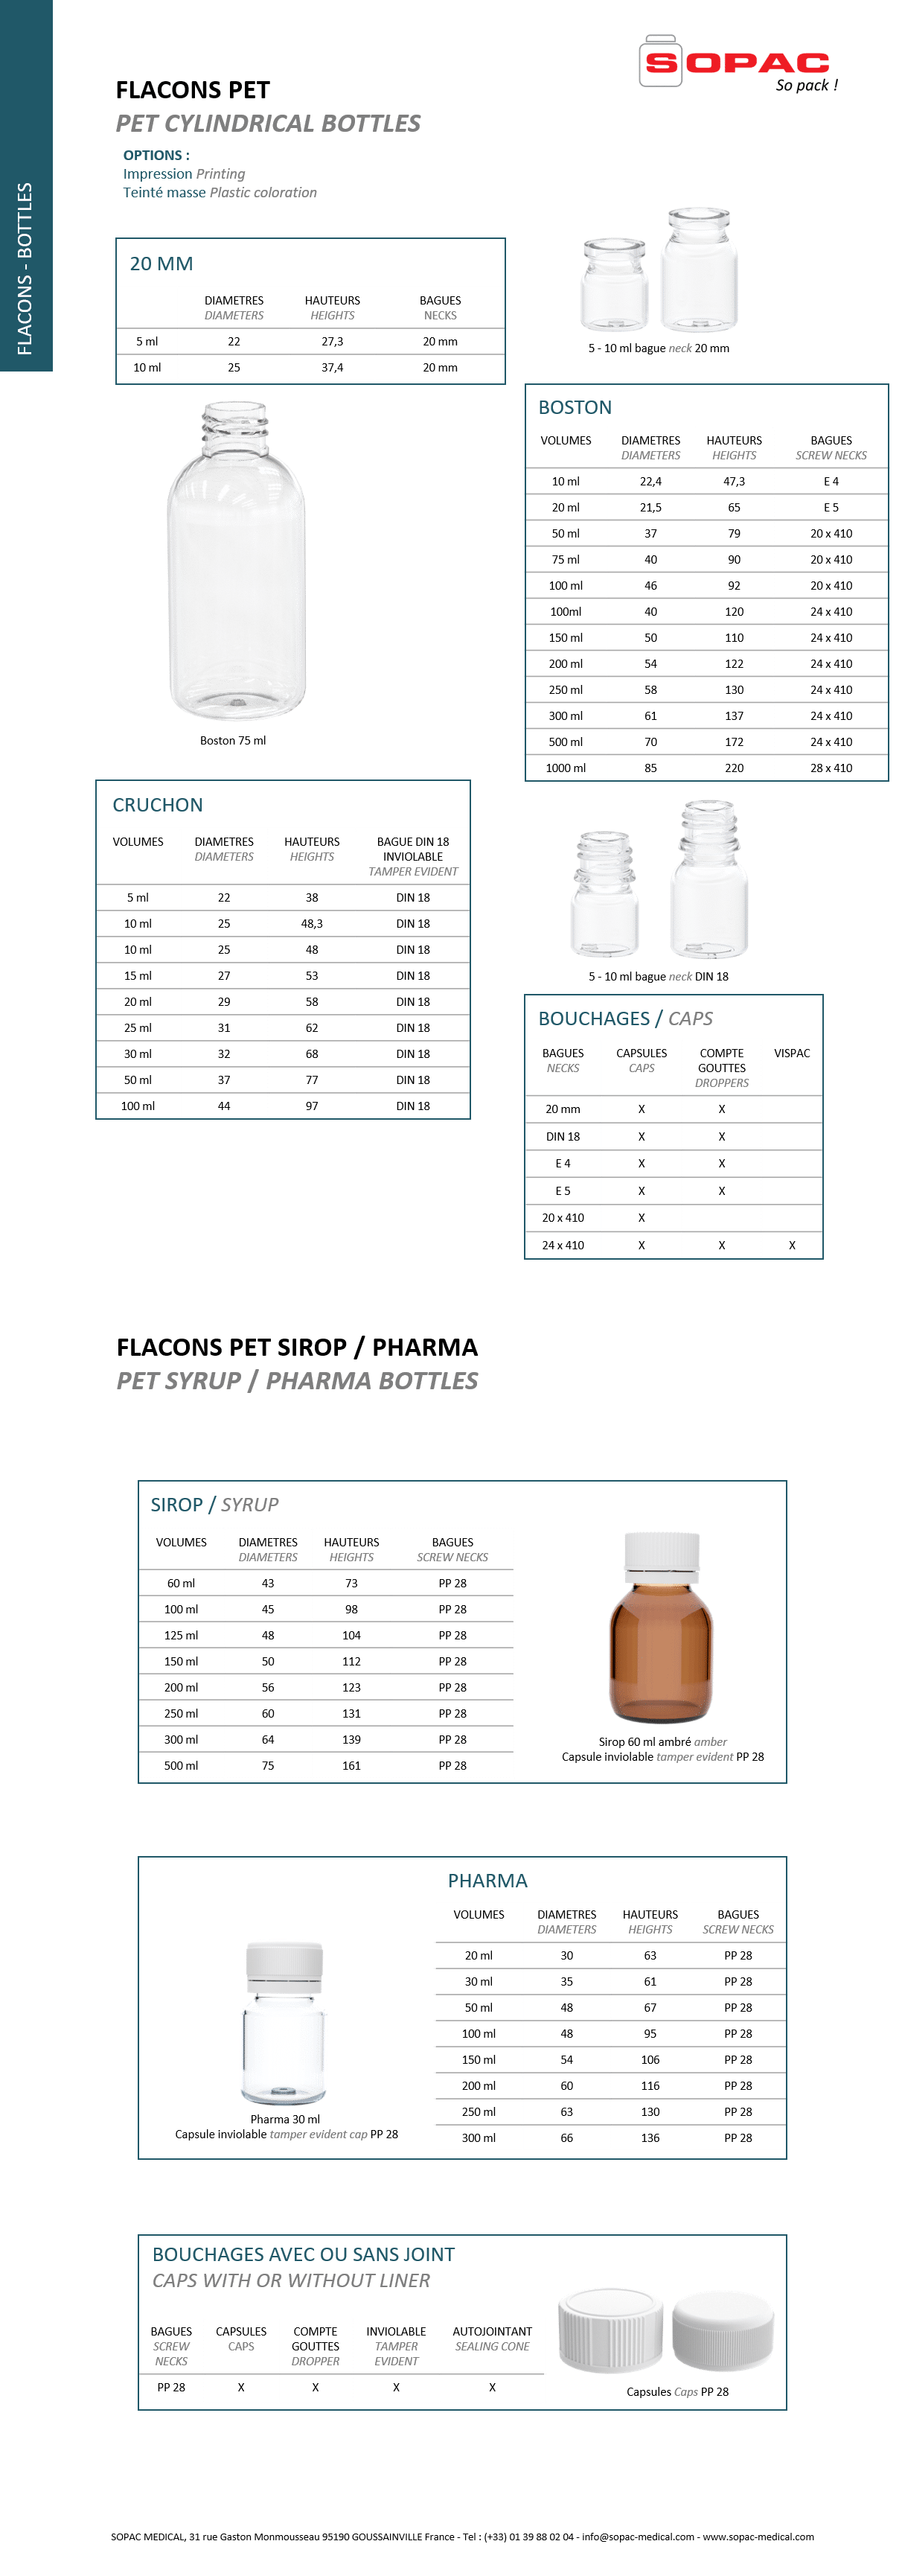 Bottle / Flacons PET + PET sirop / syrup